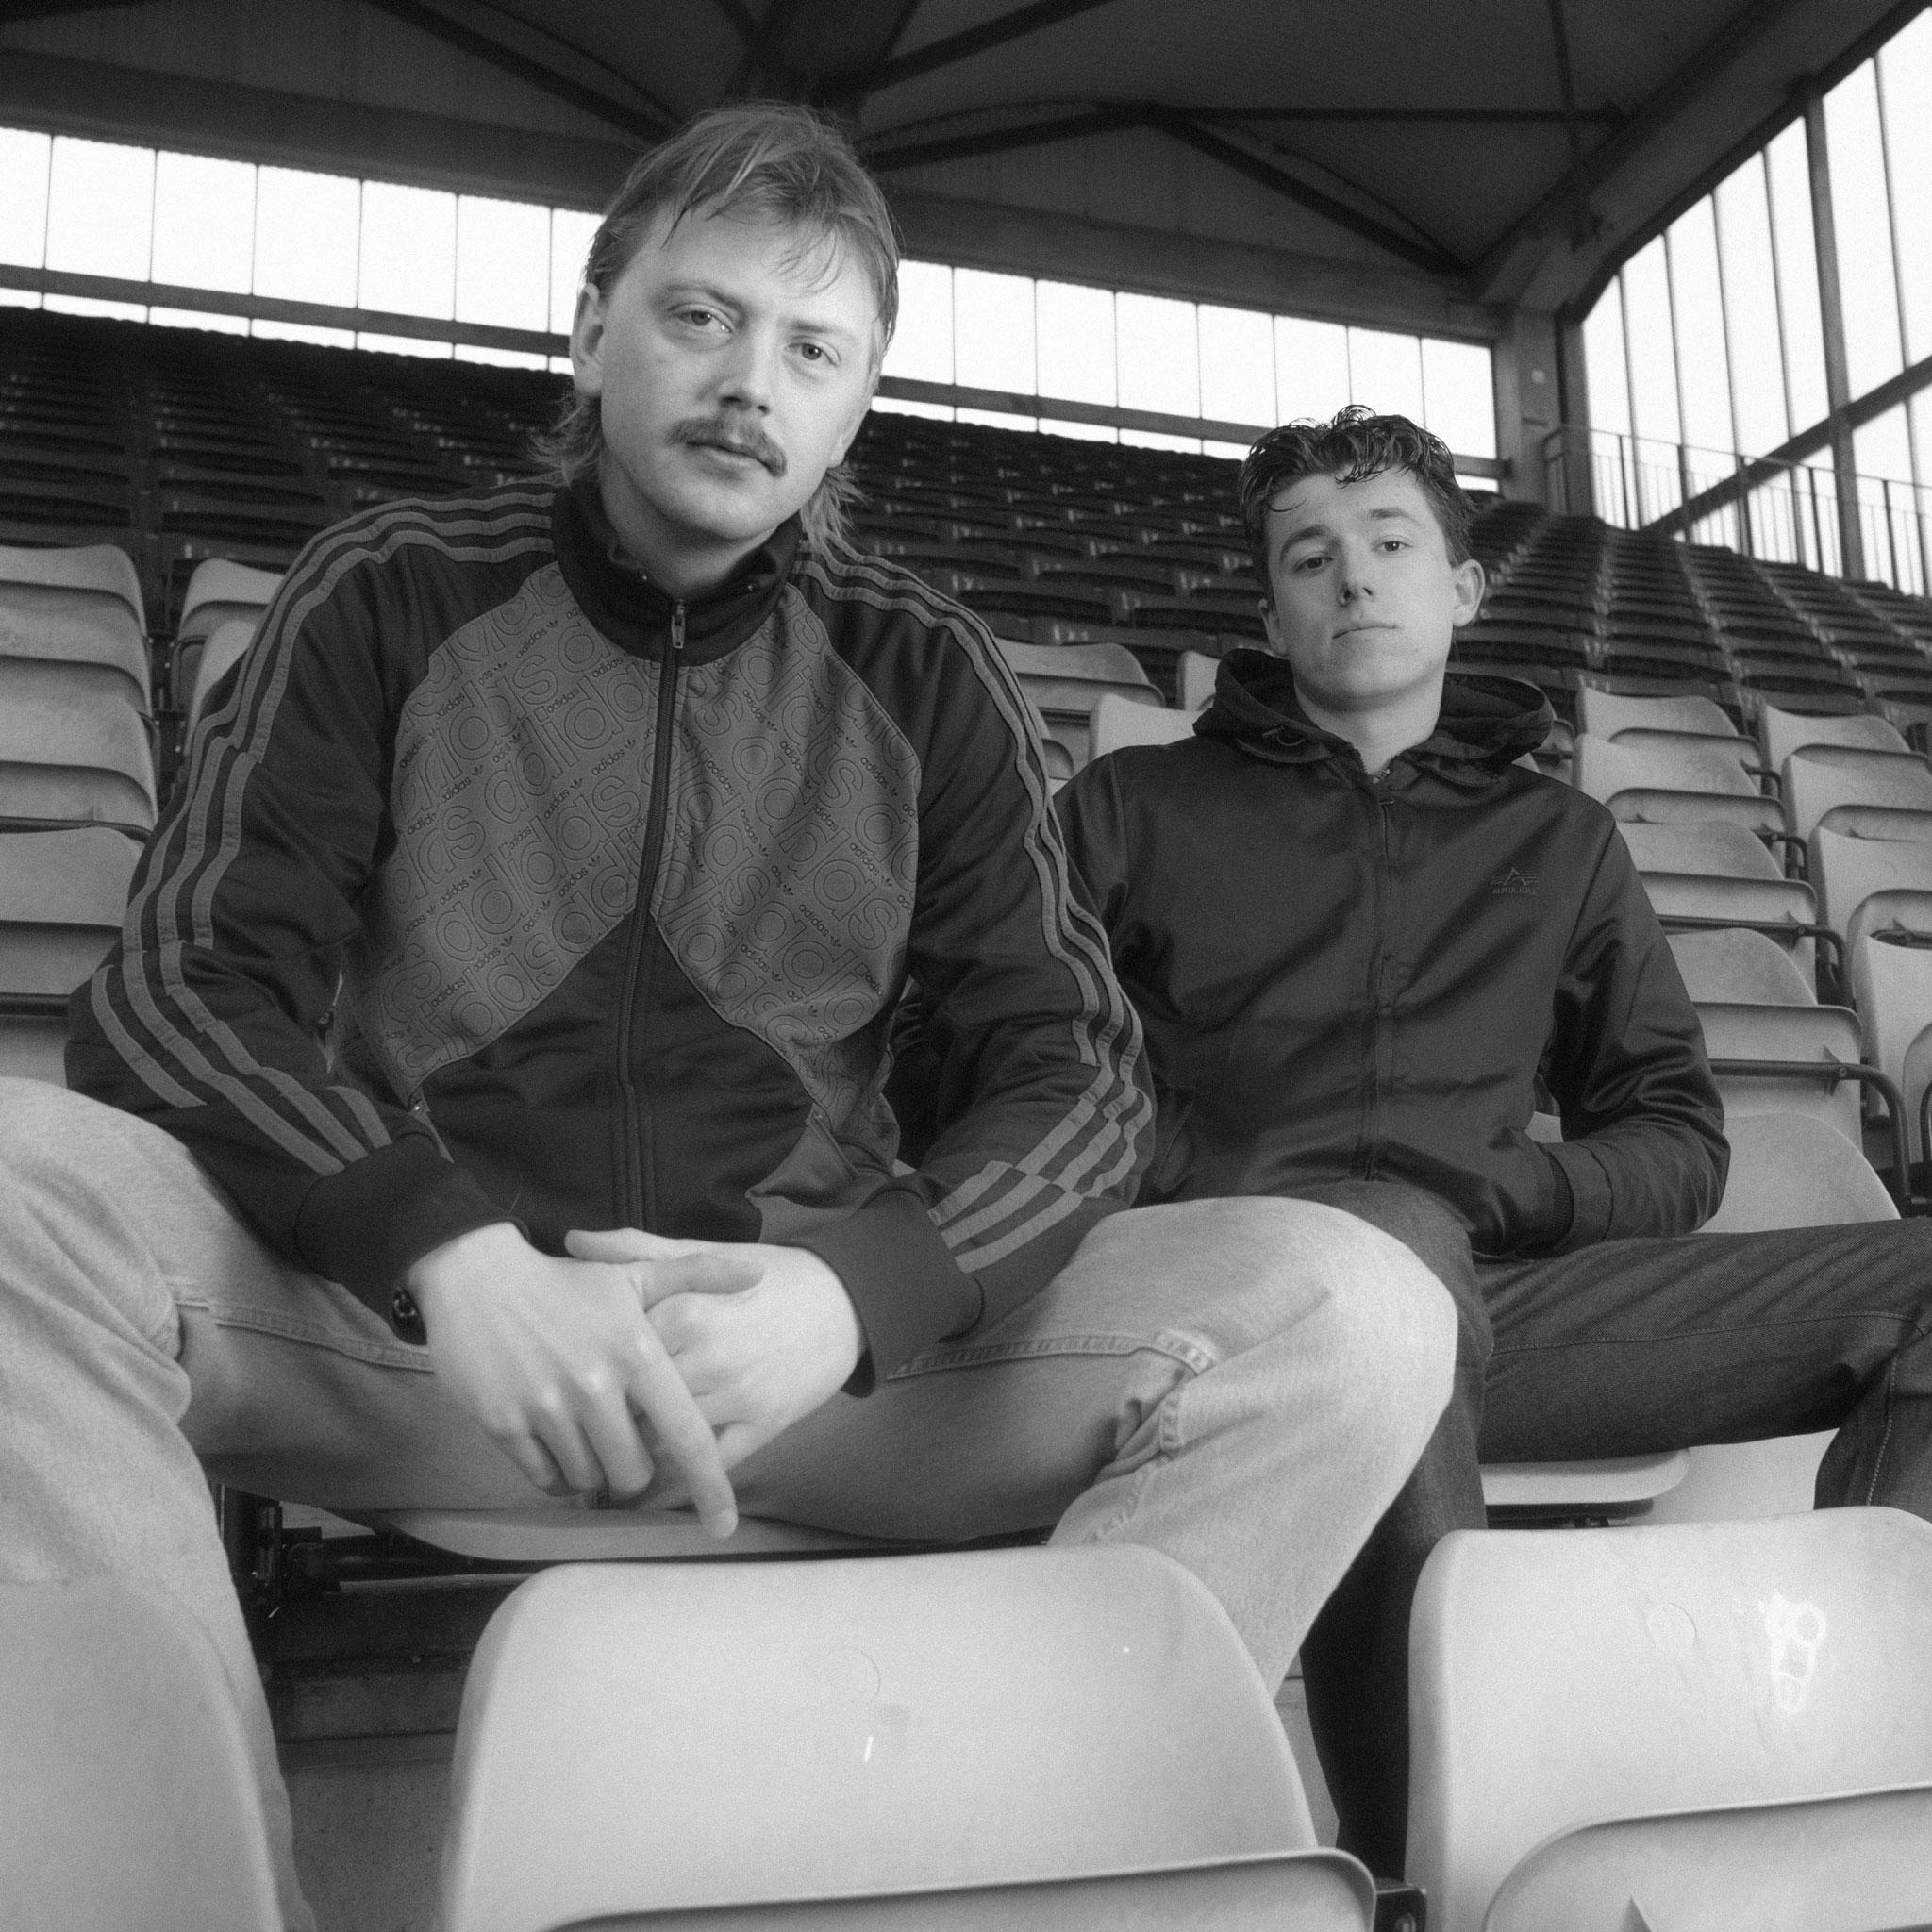 VAR har affortryllet fodbolden: Et mørkt kapitel i fodboldhistorien må smækkes i